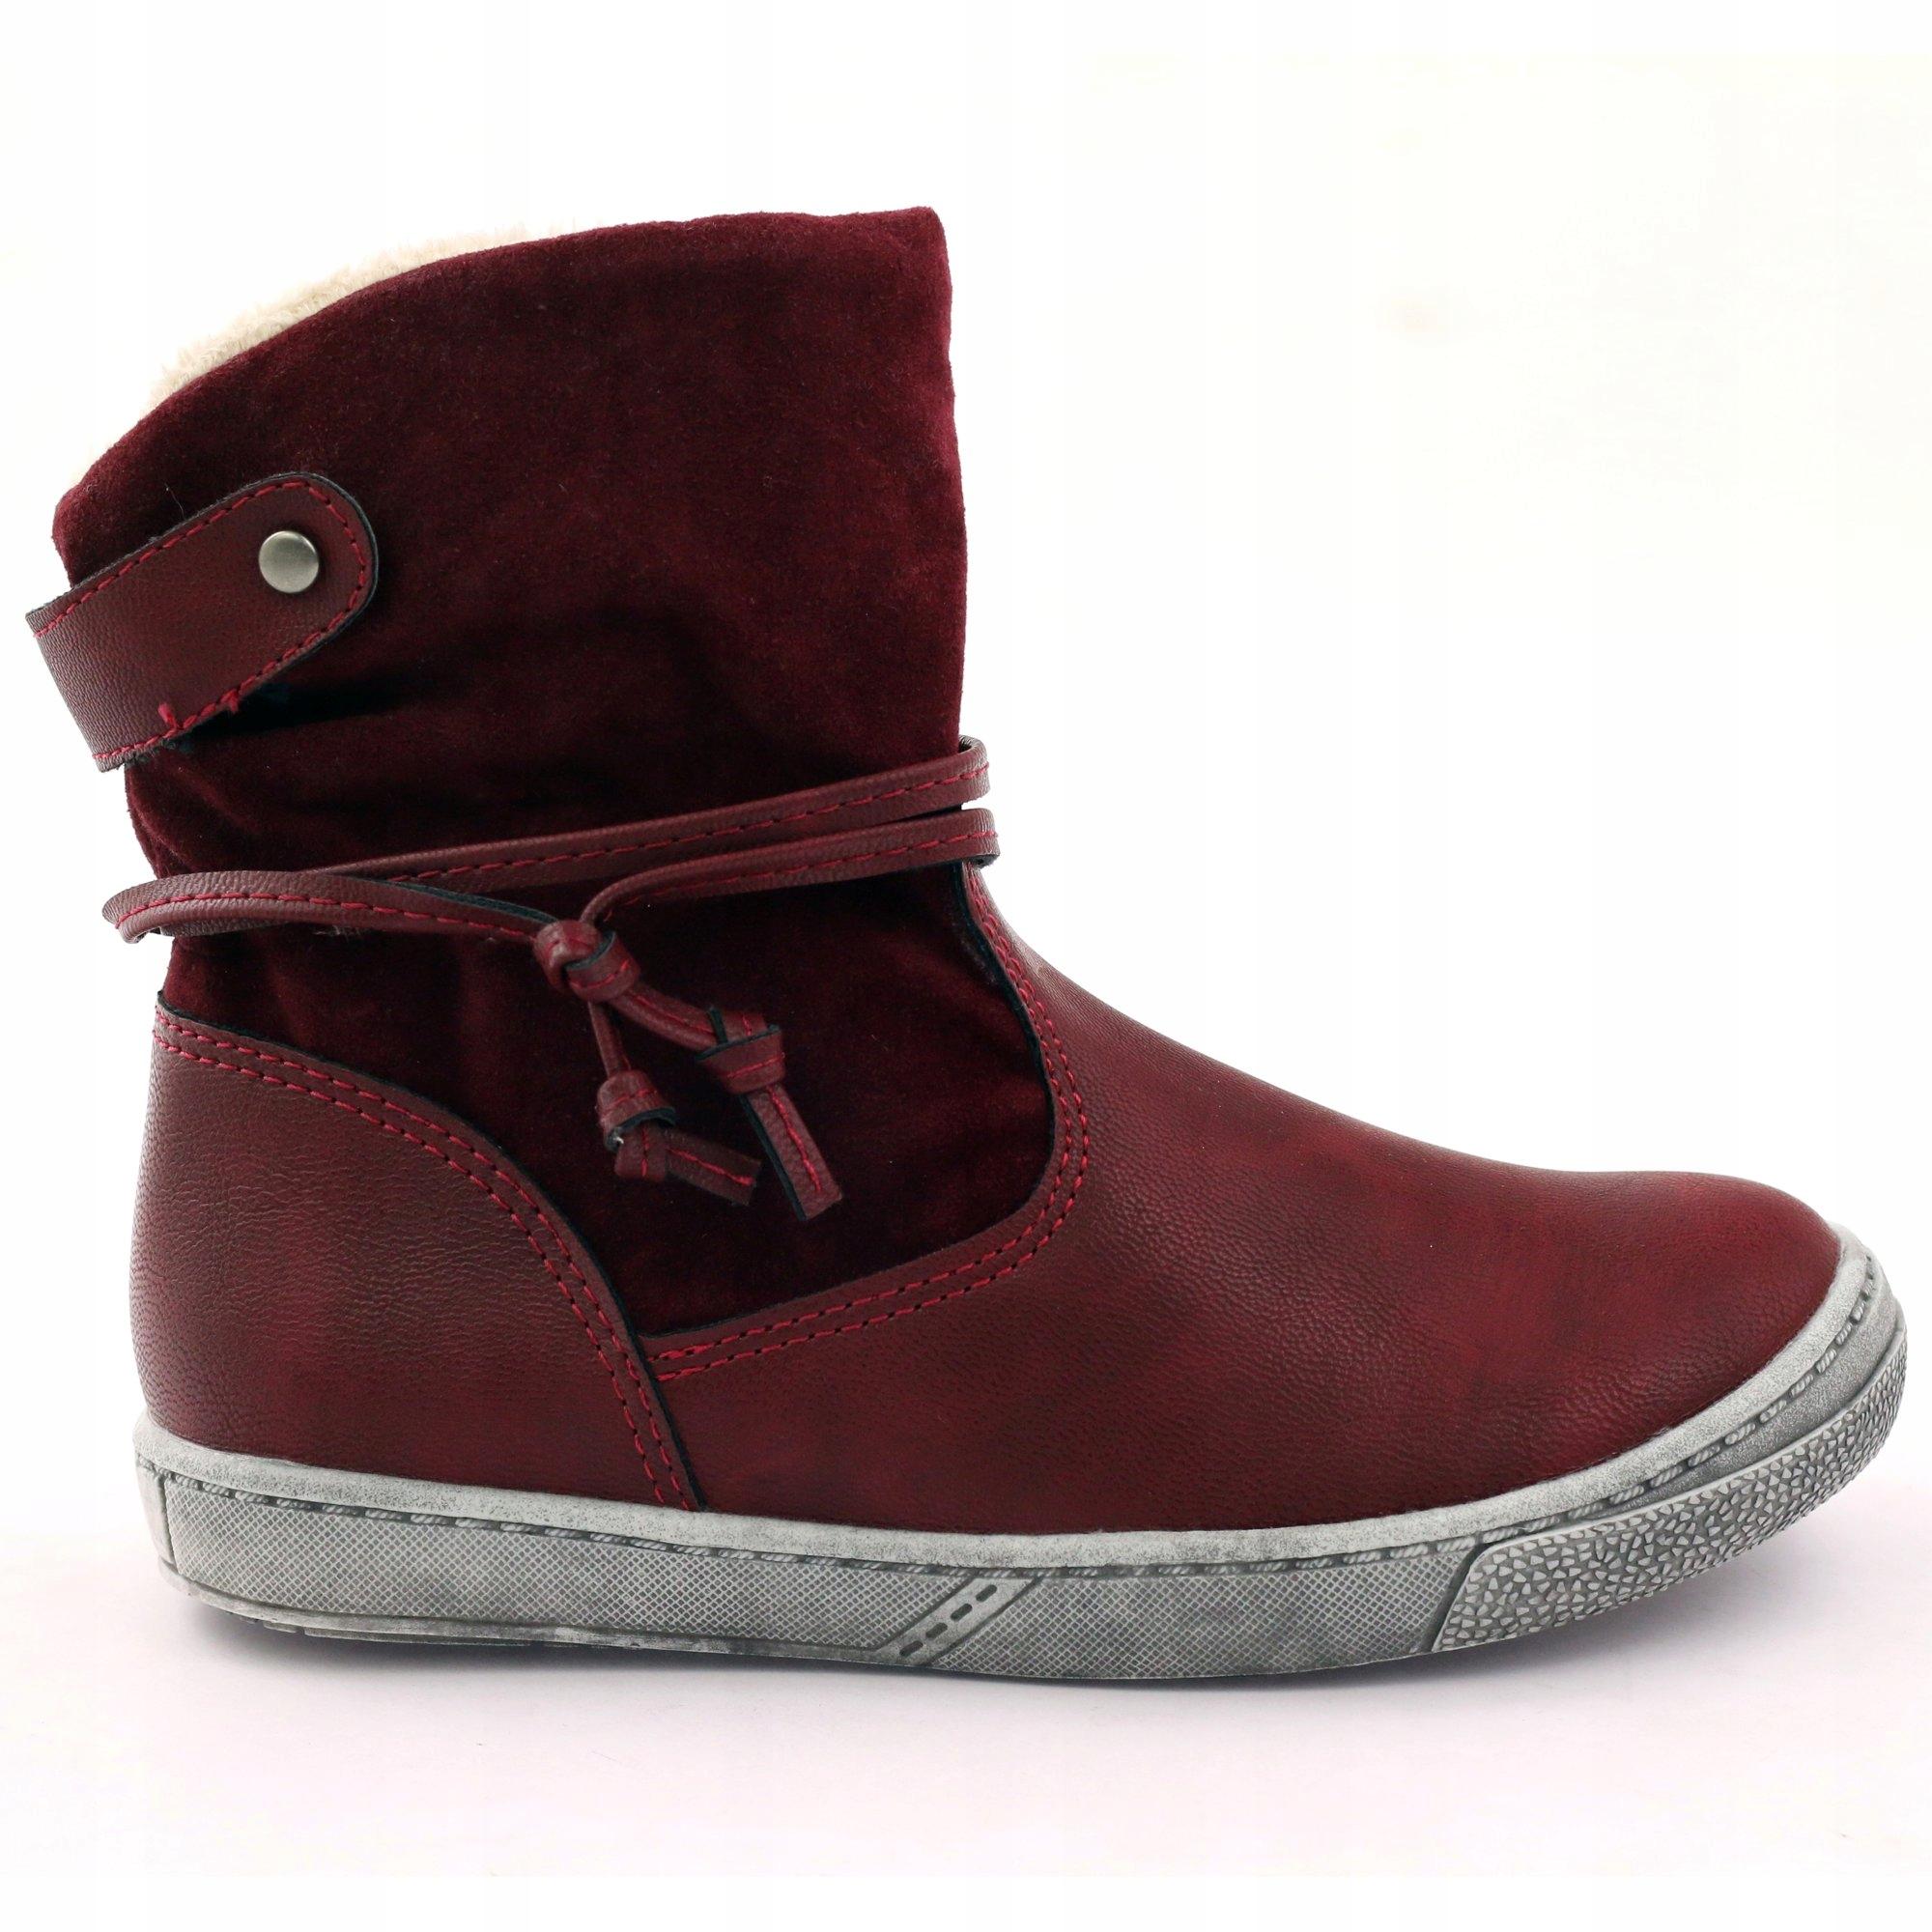 Kozaki buty zimowe bordowe American 16183 r.27